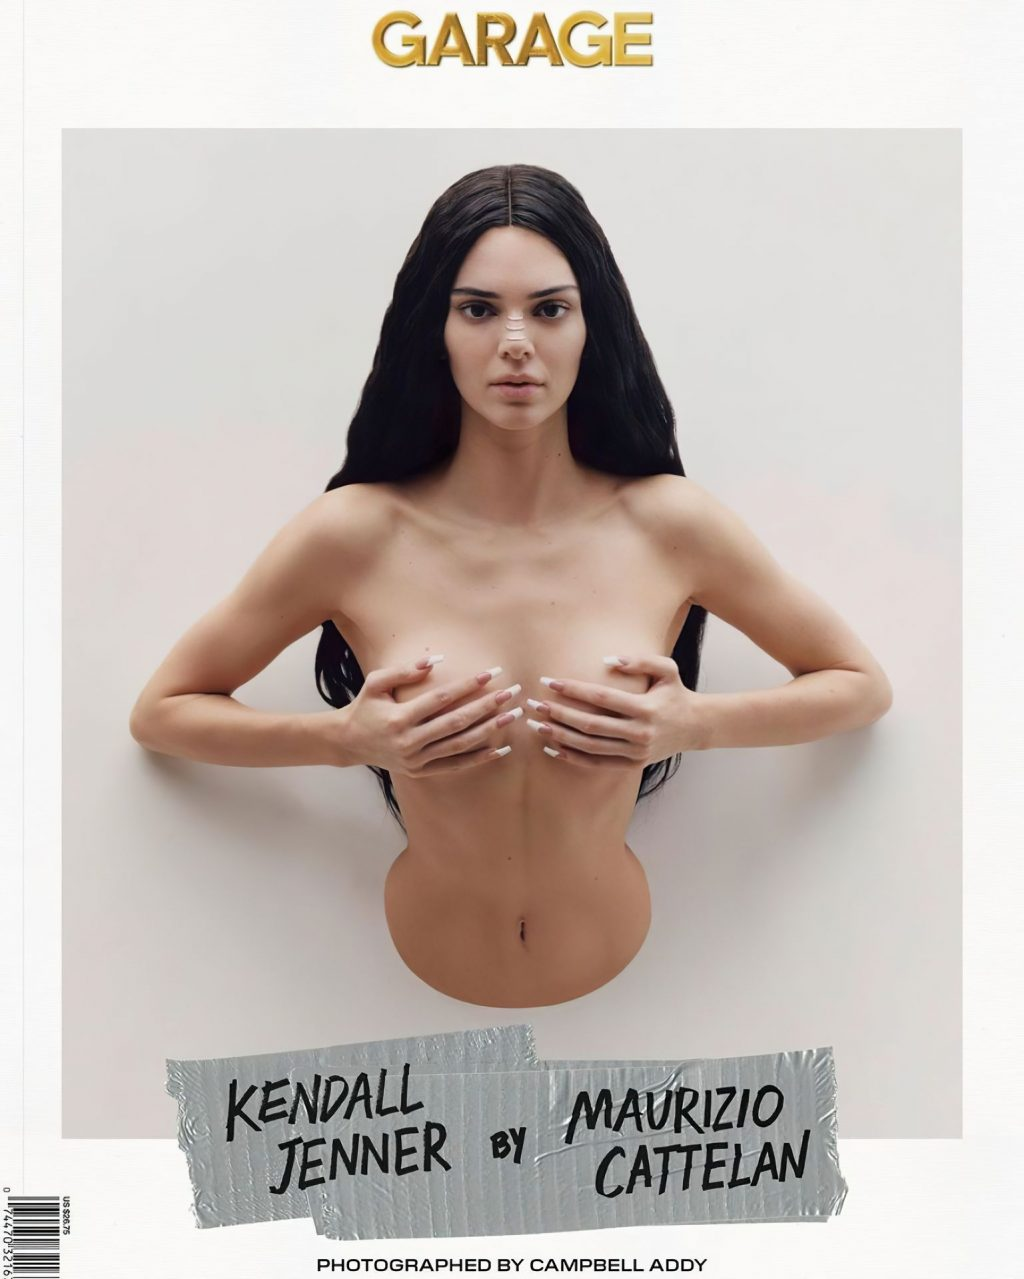 Kendall Jenner Sexy & Topless – Garage Magazine (9 Photos)